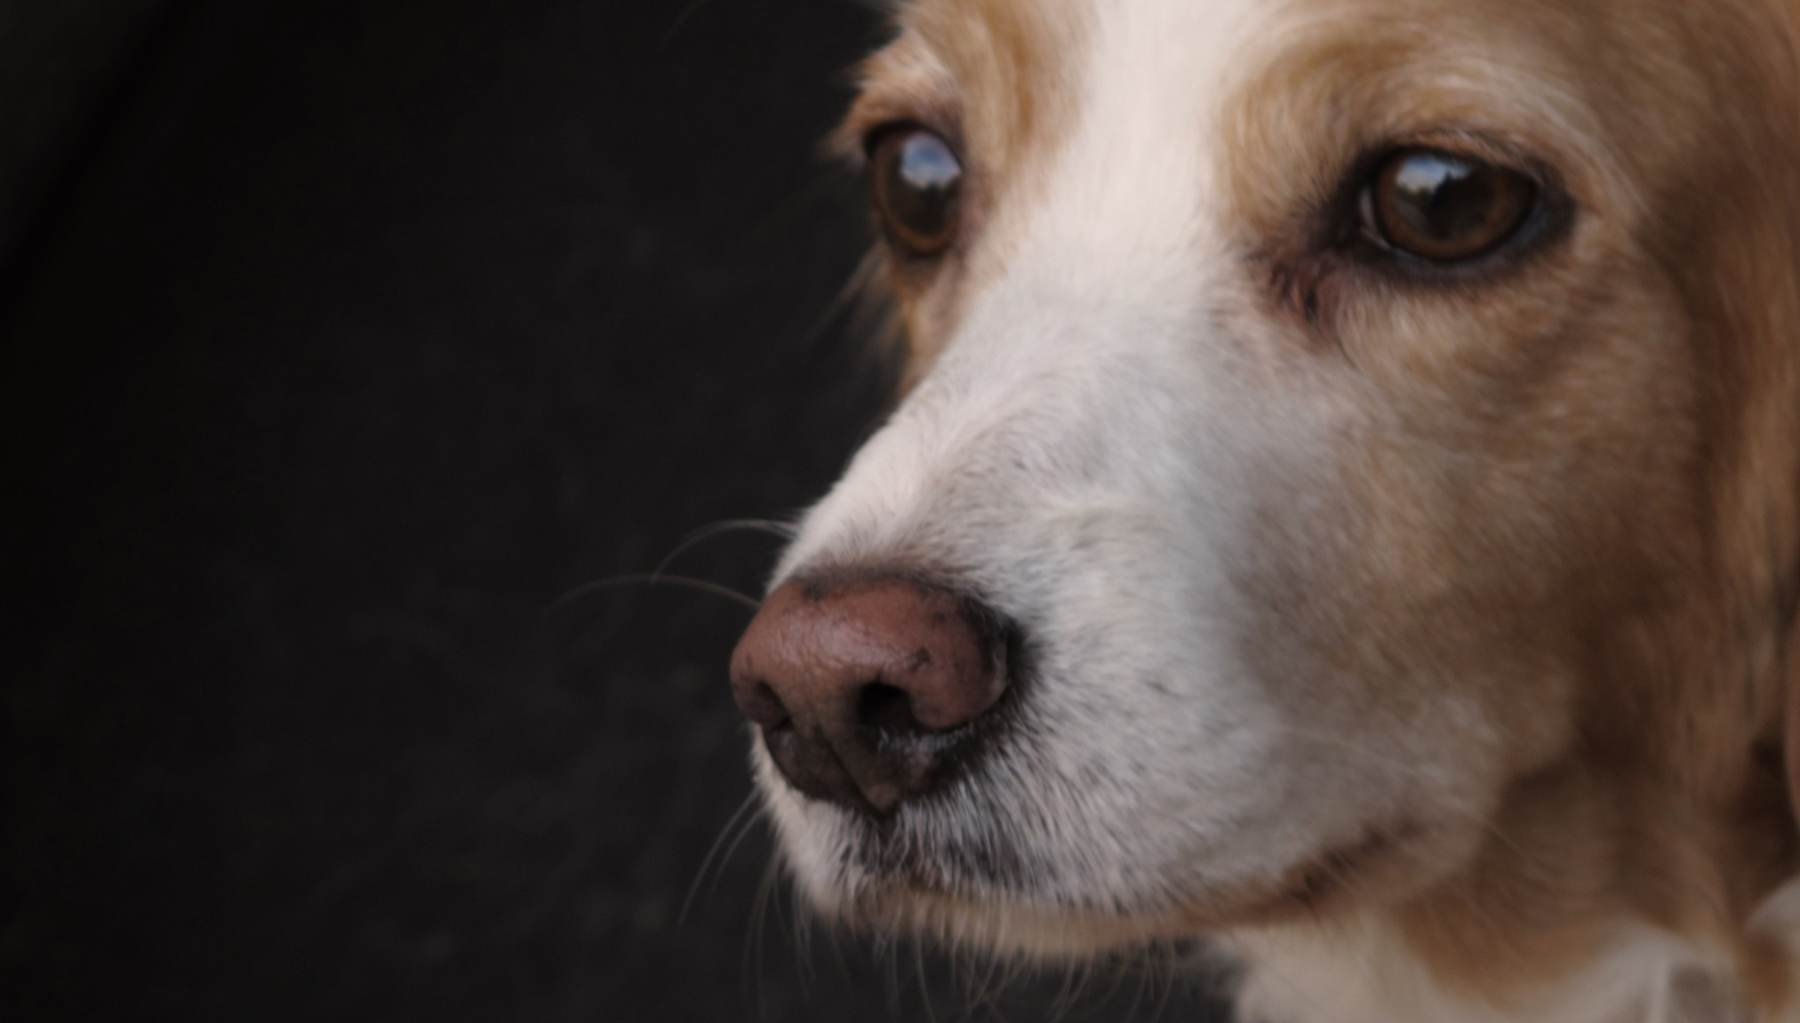 Perro tiene la nariz blanca